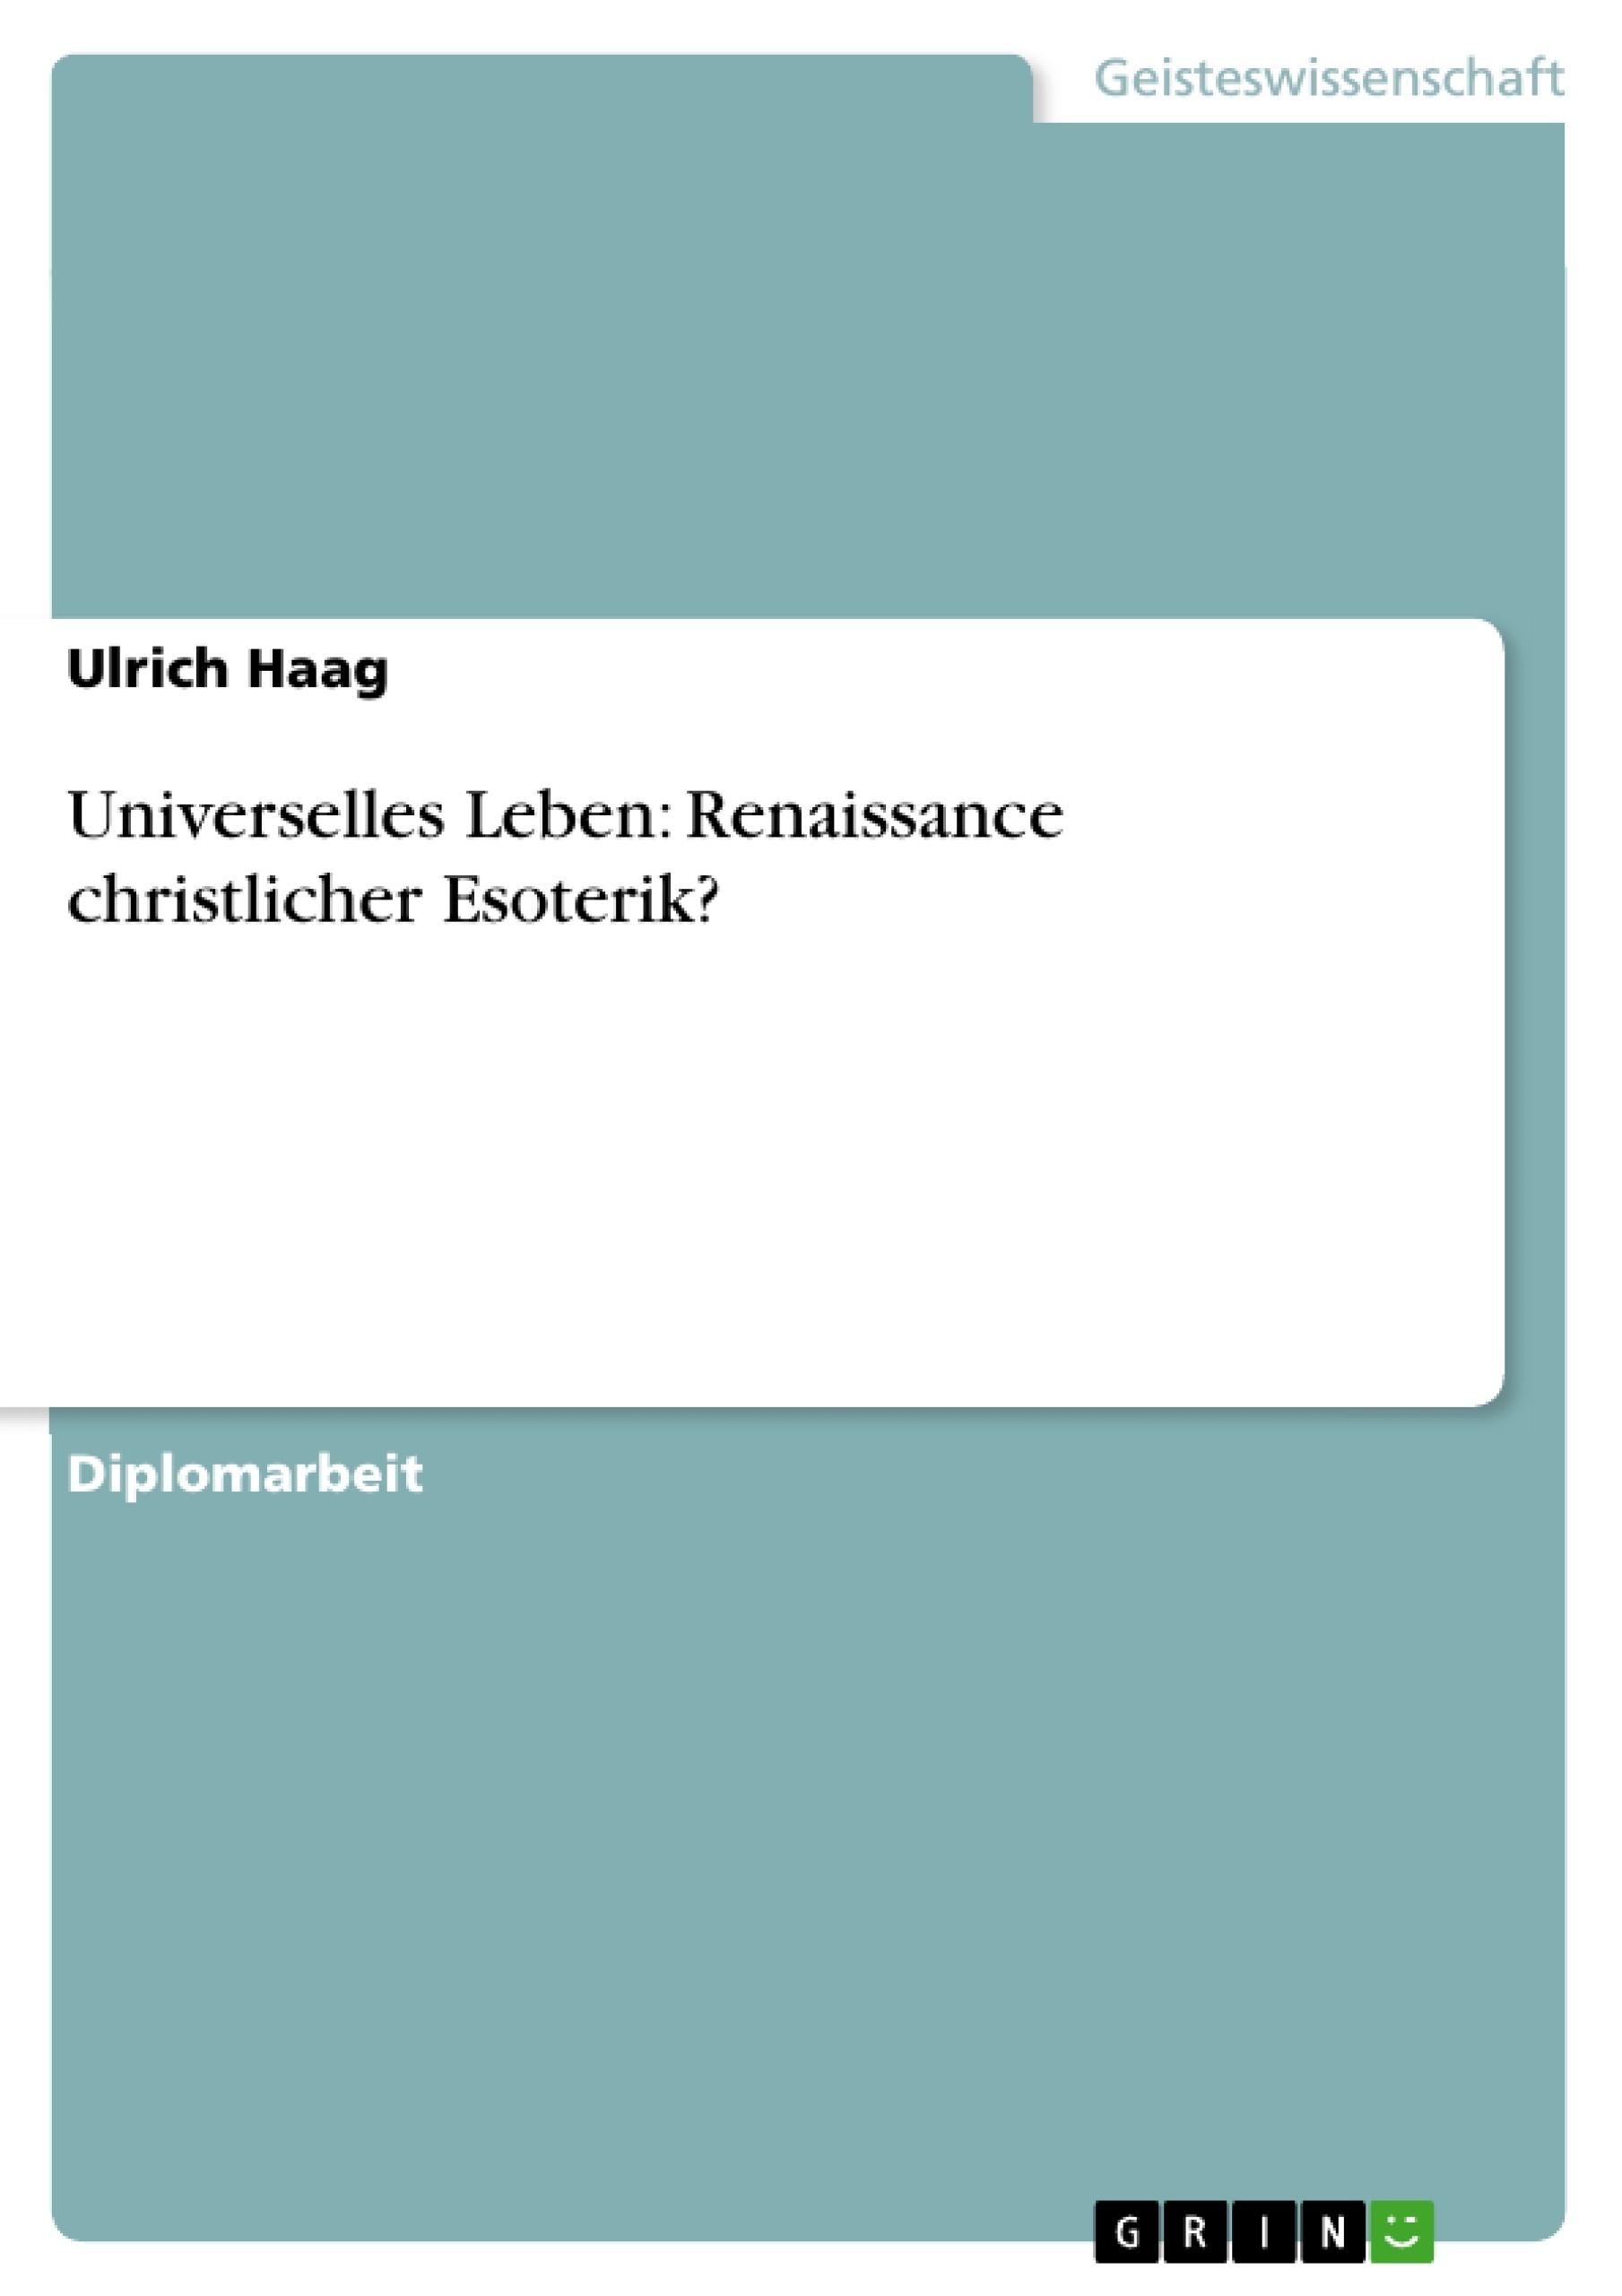 Titel: Universelles Leben: Renaissance christlicher Esoterik?